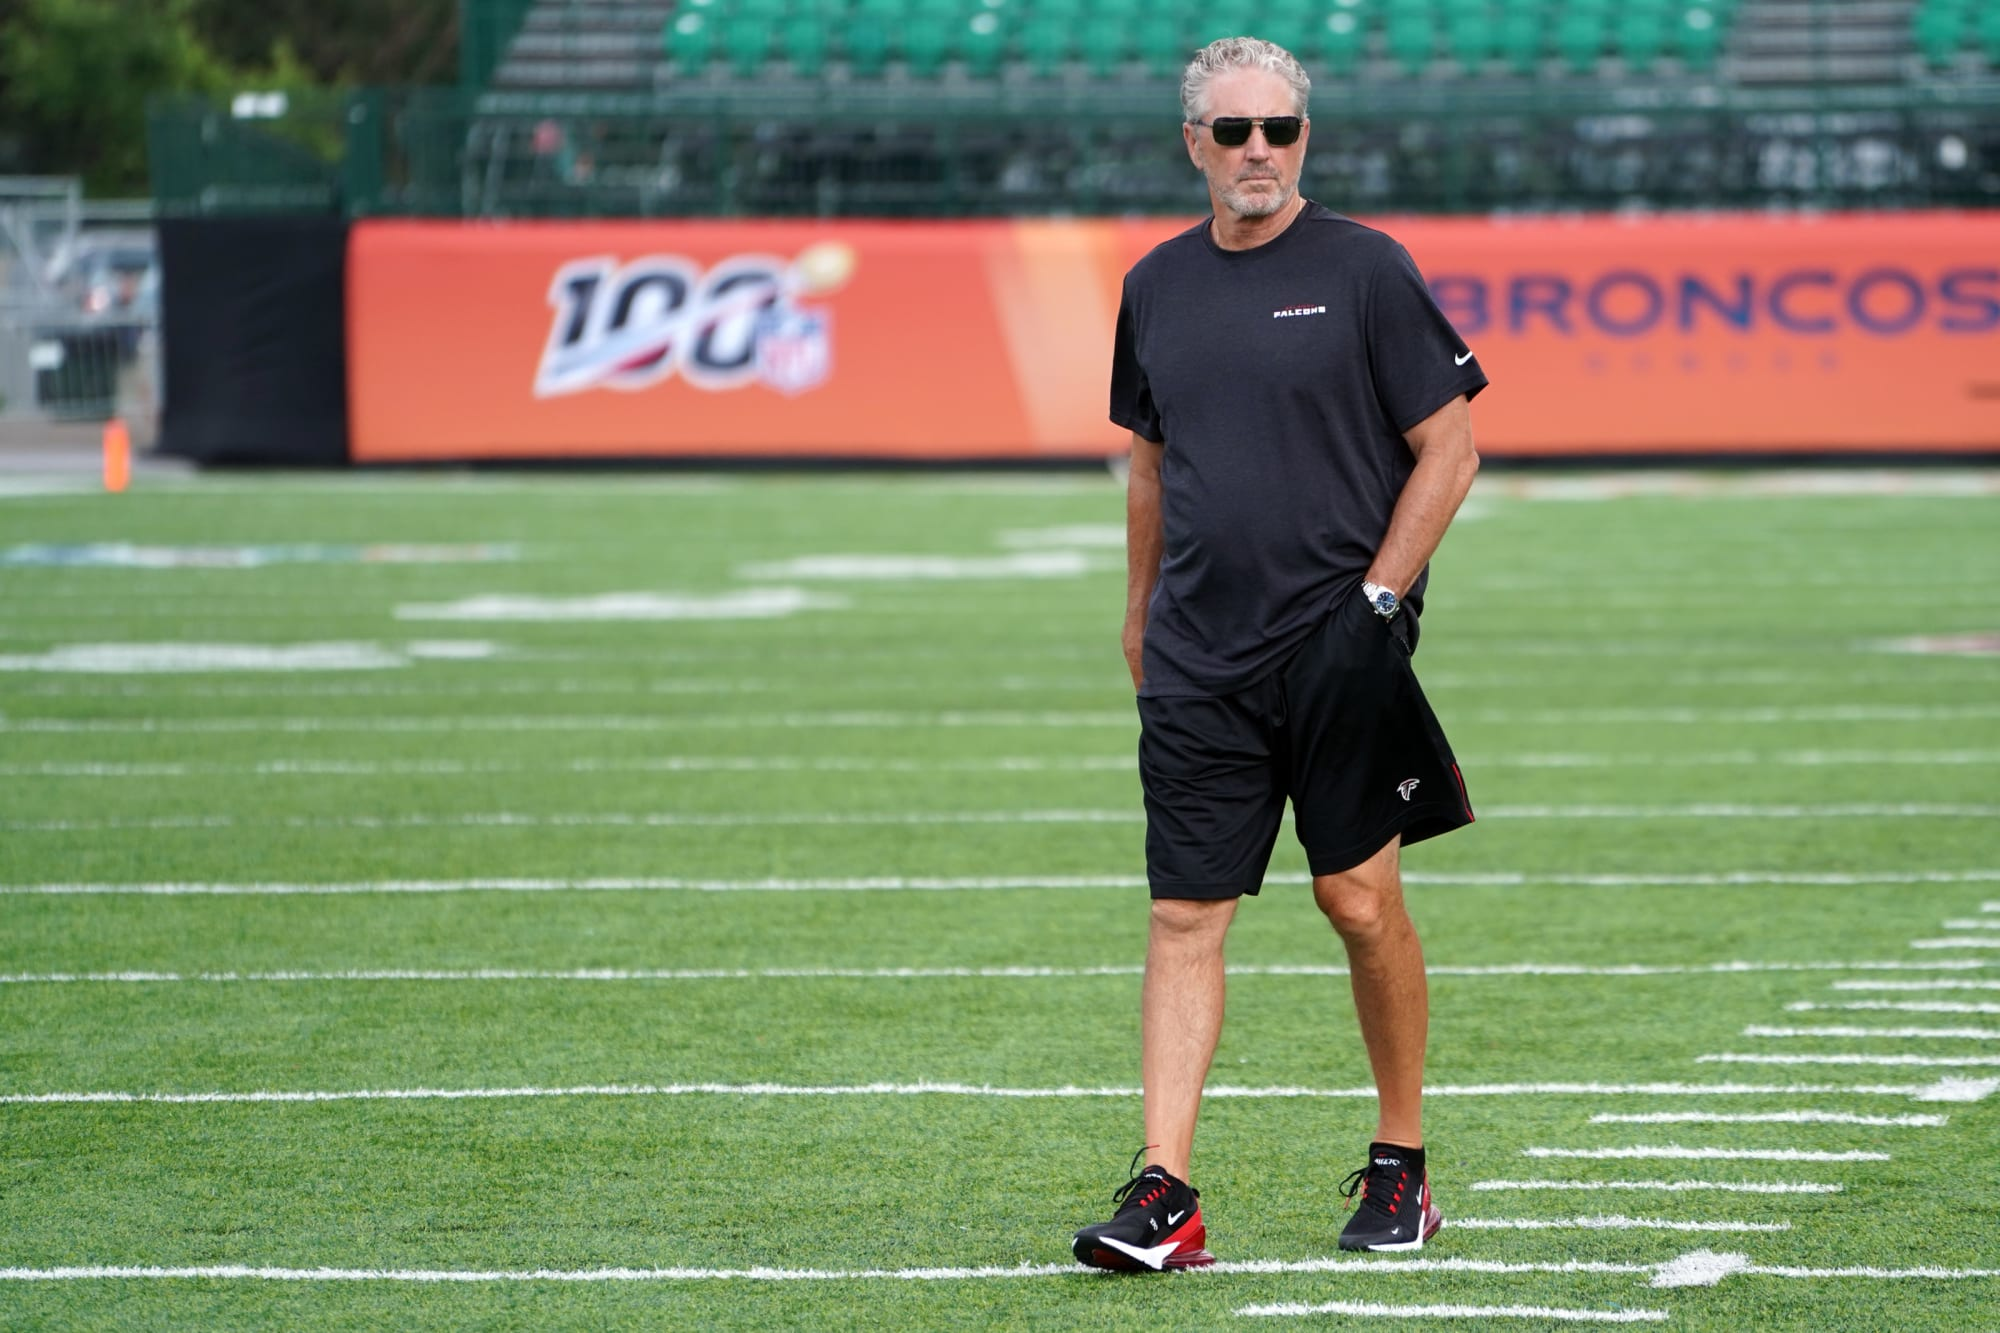 Atlanta Falcons: This should be Dirk Koetter's last job in the NFL